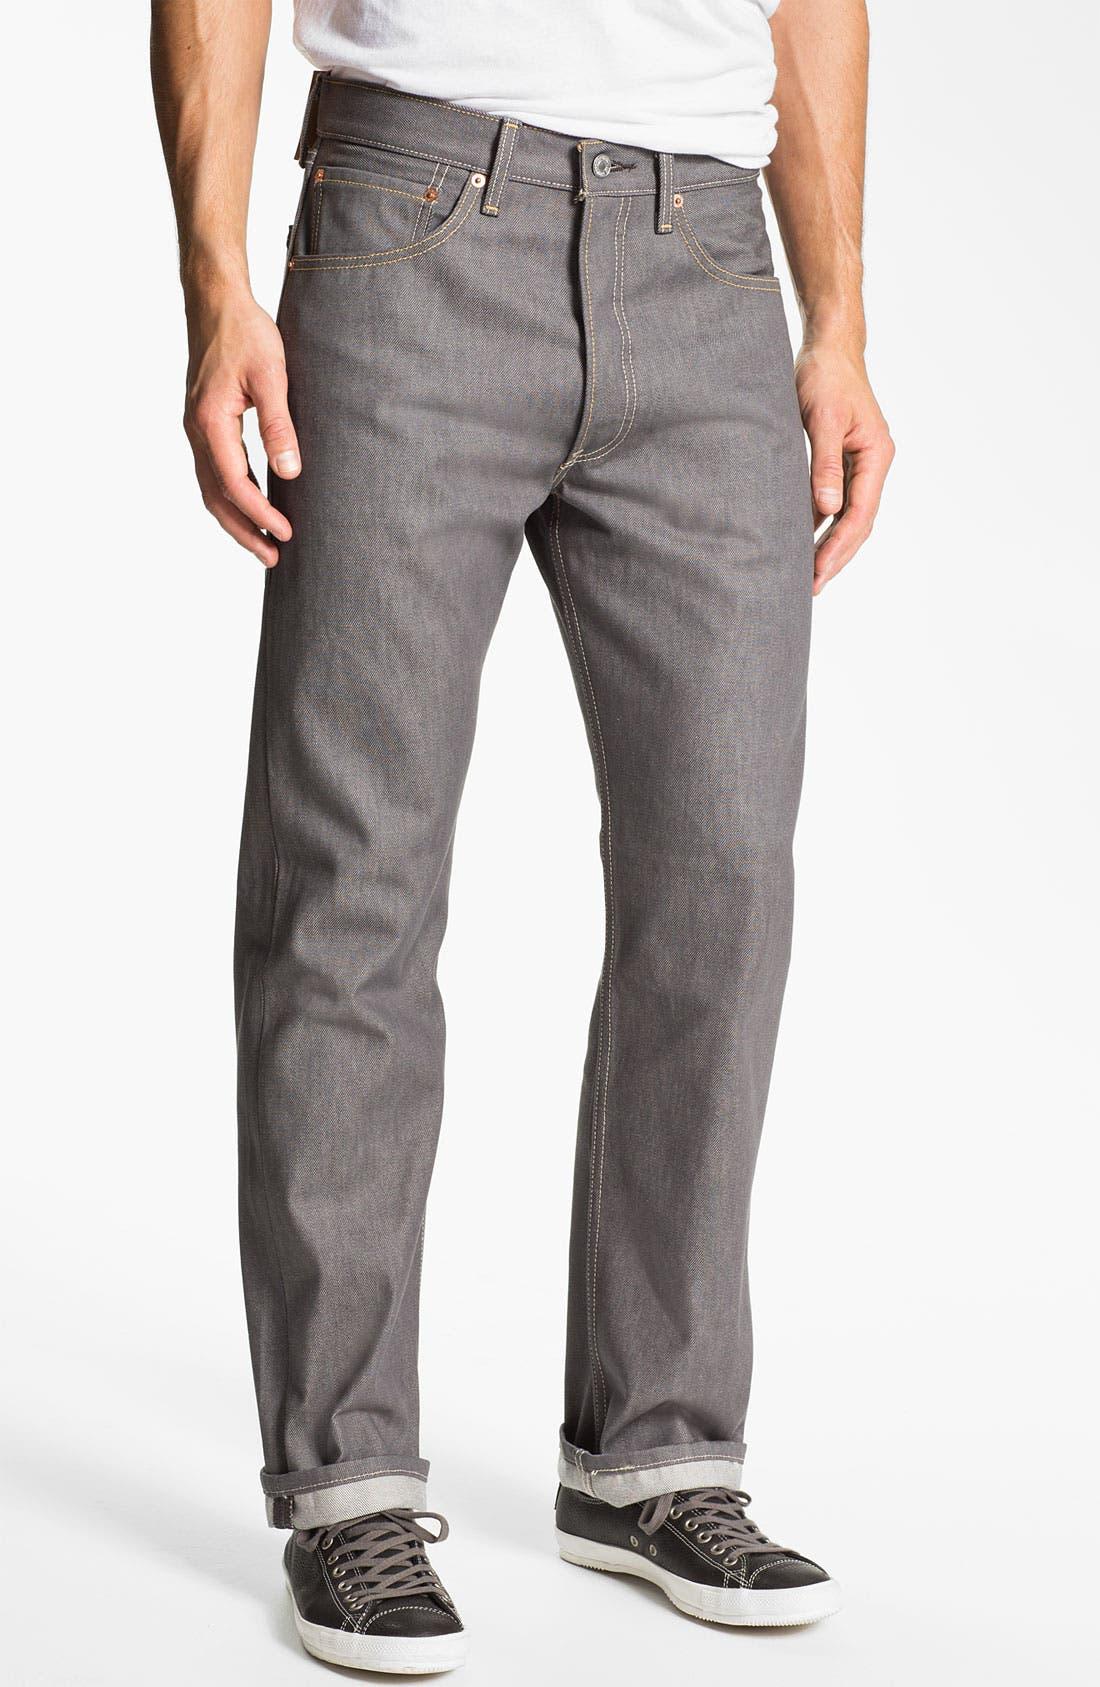 Alternate Image 1 Selected - Levi's® Red Tab™ 501® Straight Leg Jeans (Grey Rigid) (Regular & Tall)